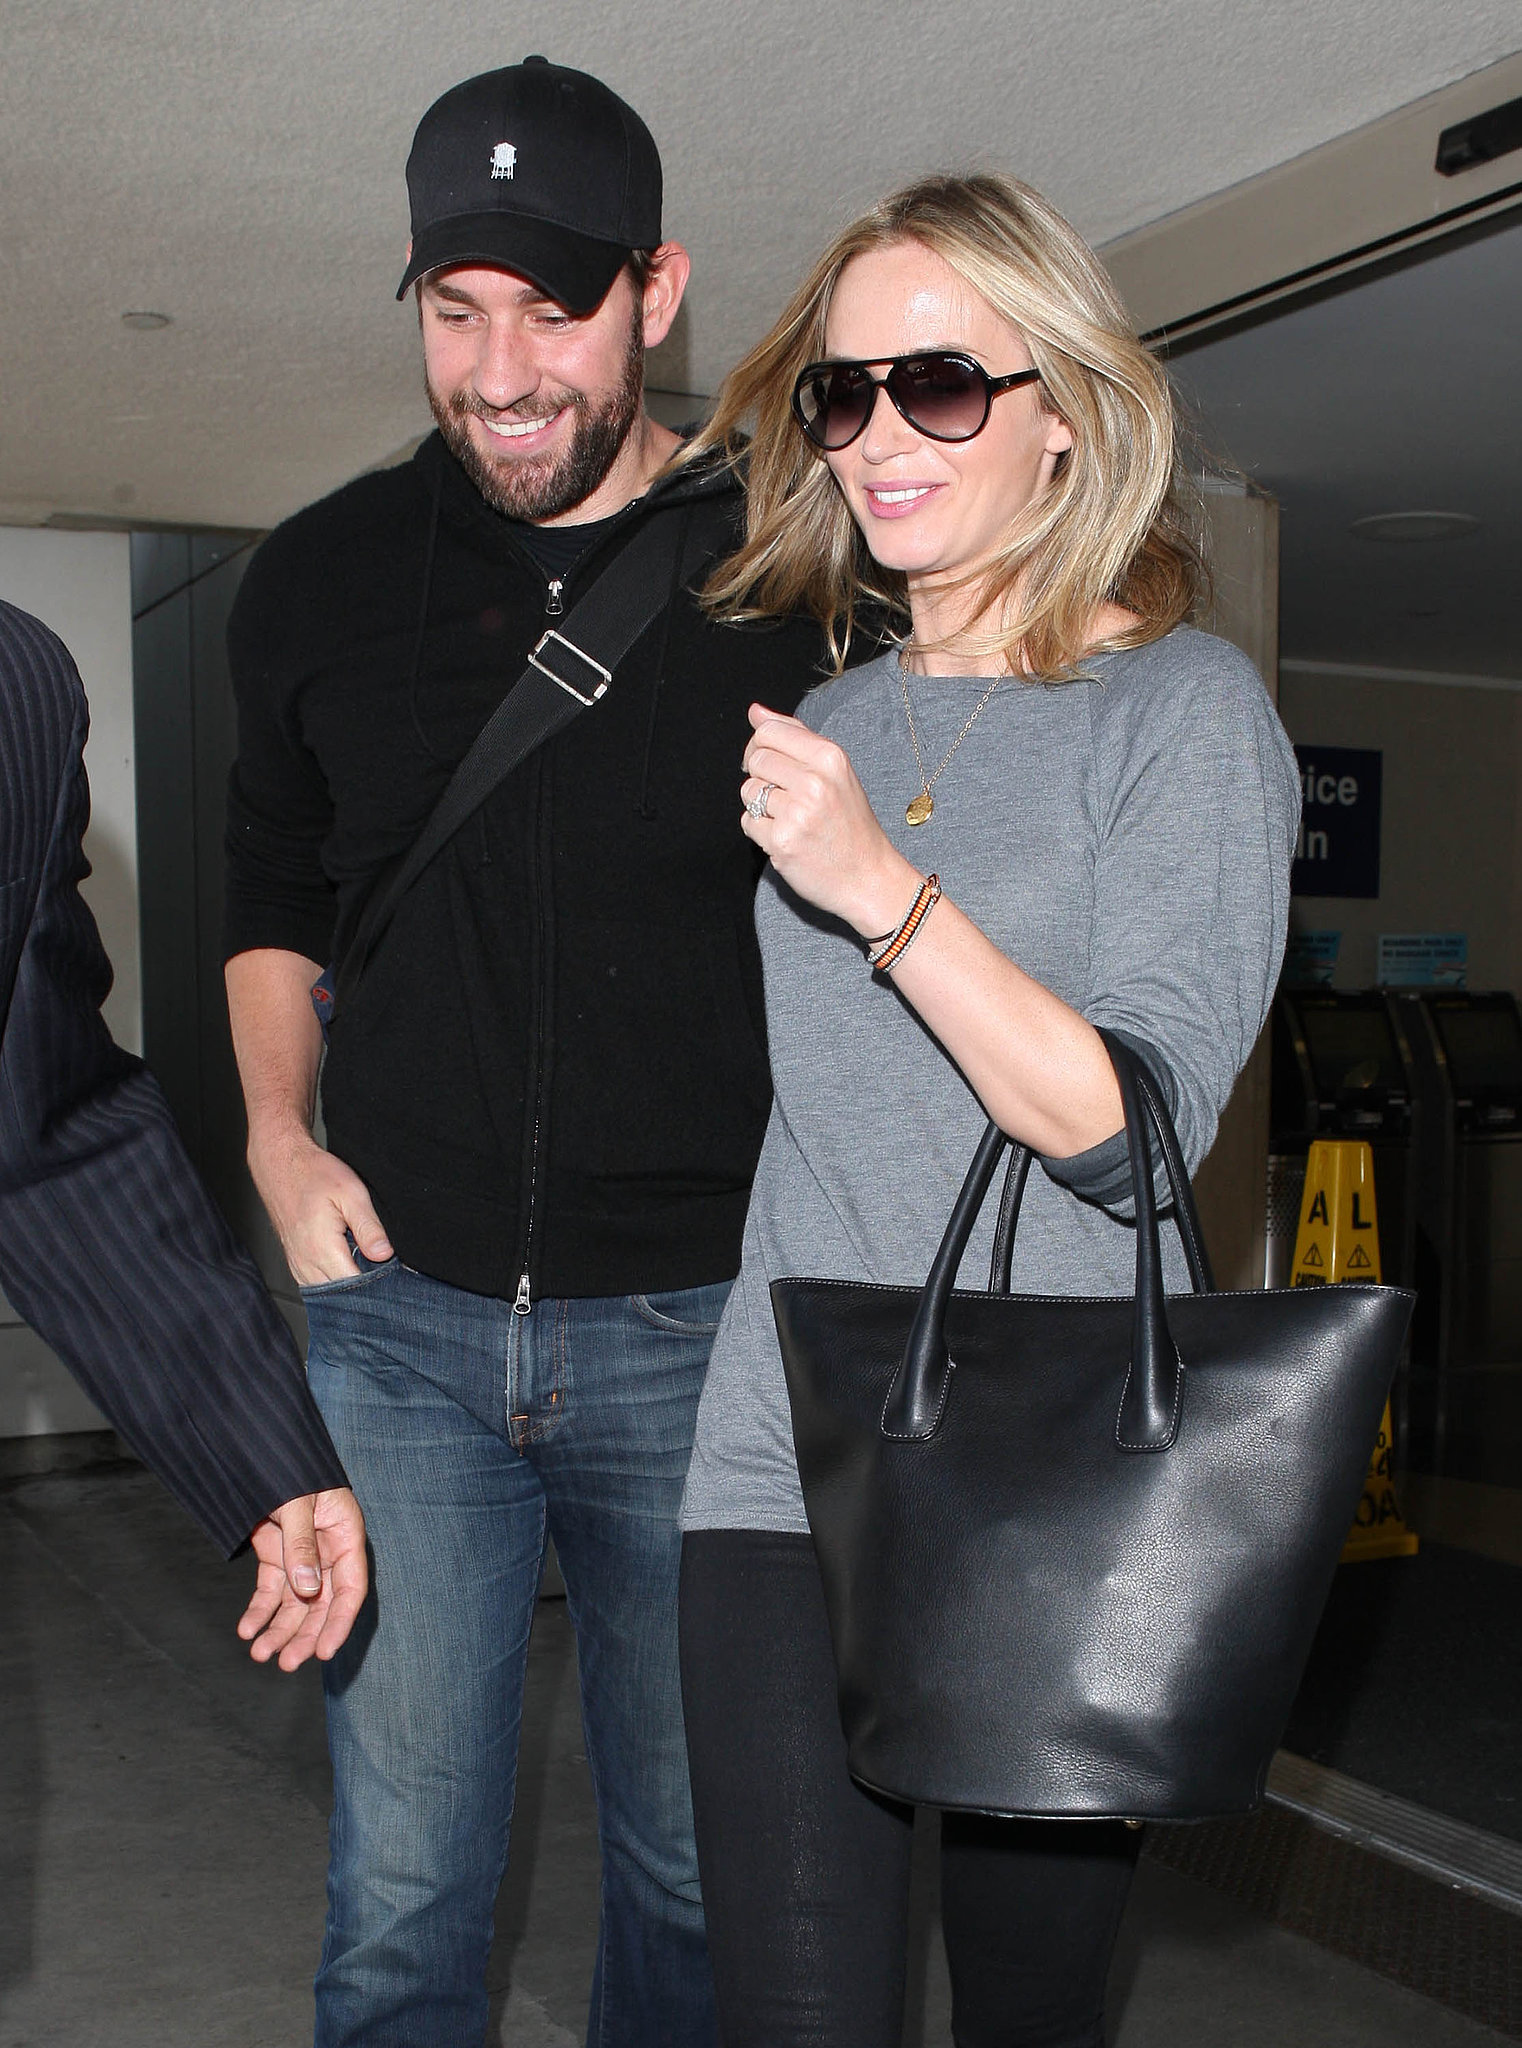 John Krasinski and Emily Blunt Return to LA to End His Office Run